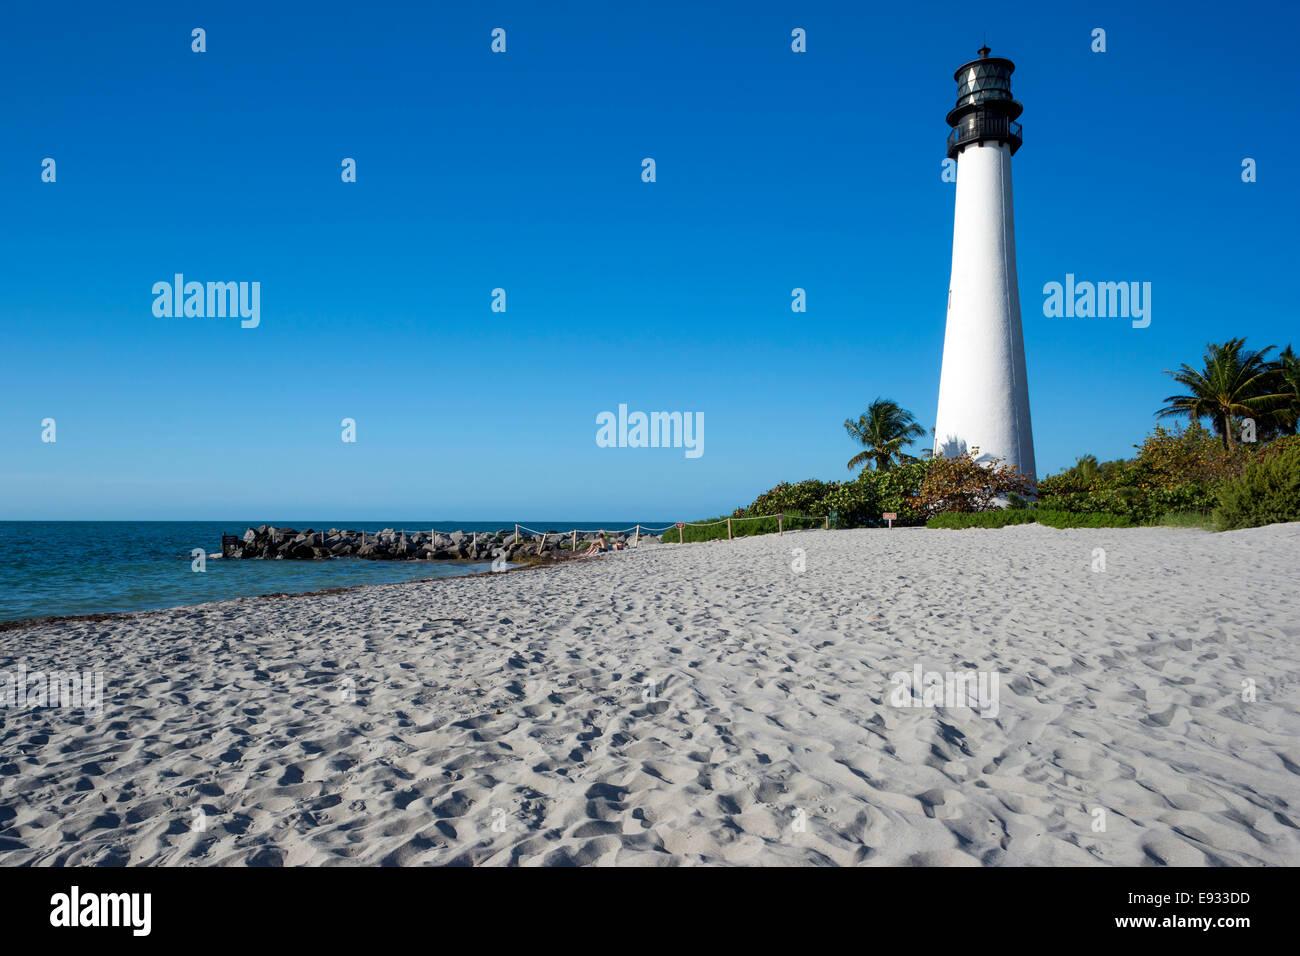 SAND BEACH LIGHTHOUSE CAPE FLORIDA STATE PARK COASTLINE BISCAYNE BAY MIAMI FLORIDA USA Stock Photo